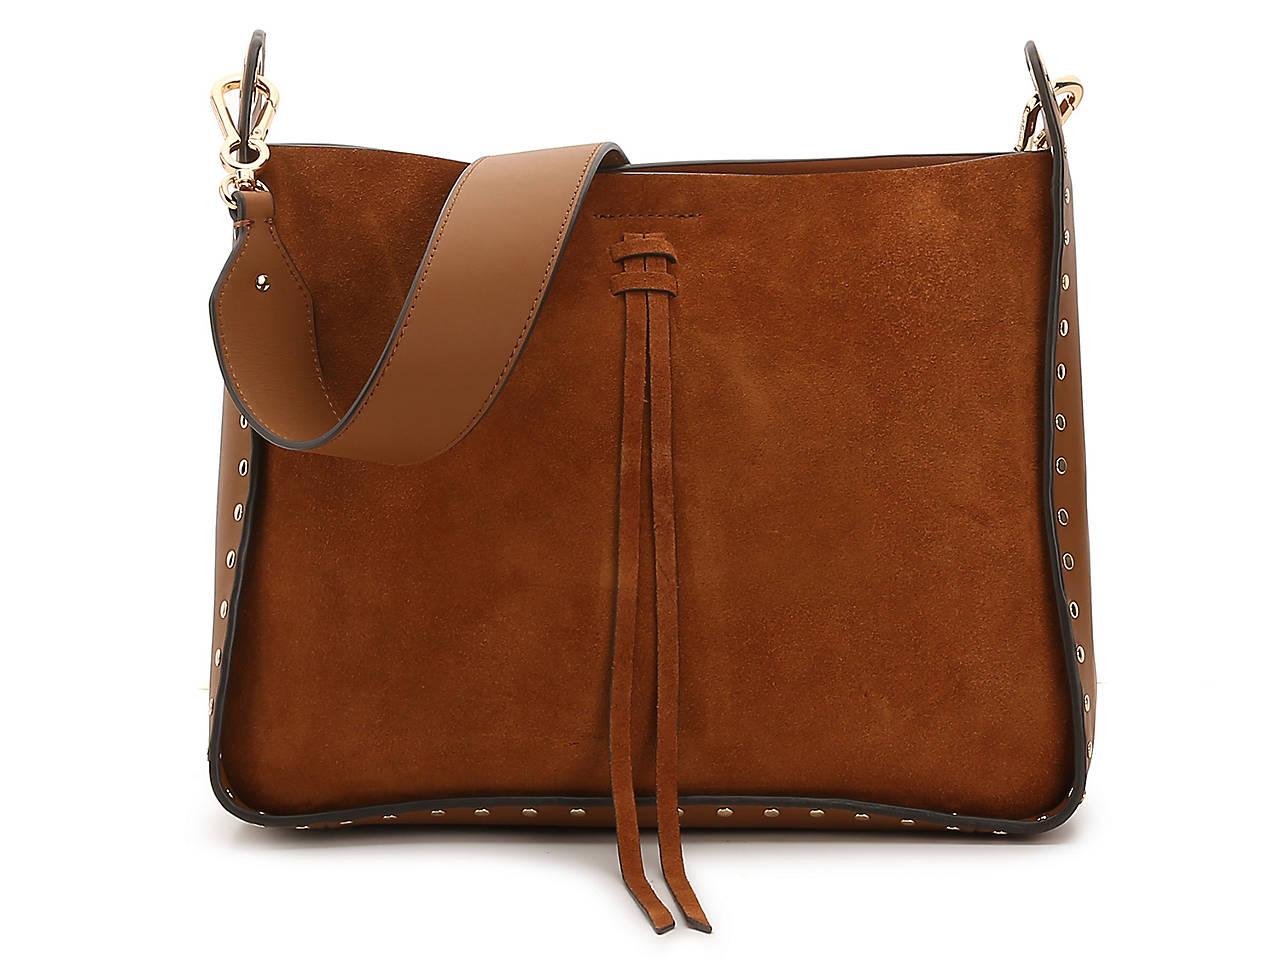 c173075a5f34 Vince Camuto Enora Crossbody Bag Women s Handbags   Accessories